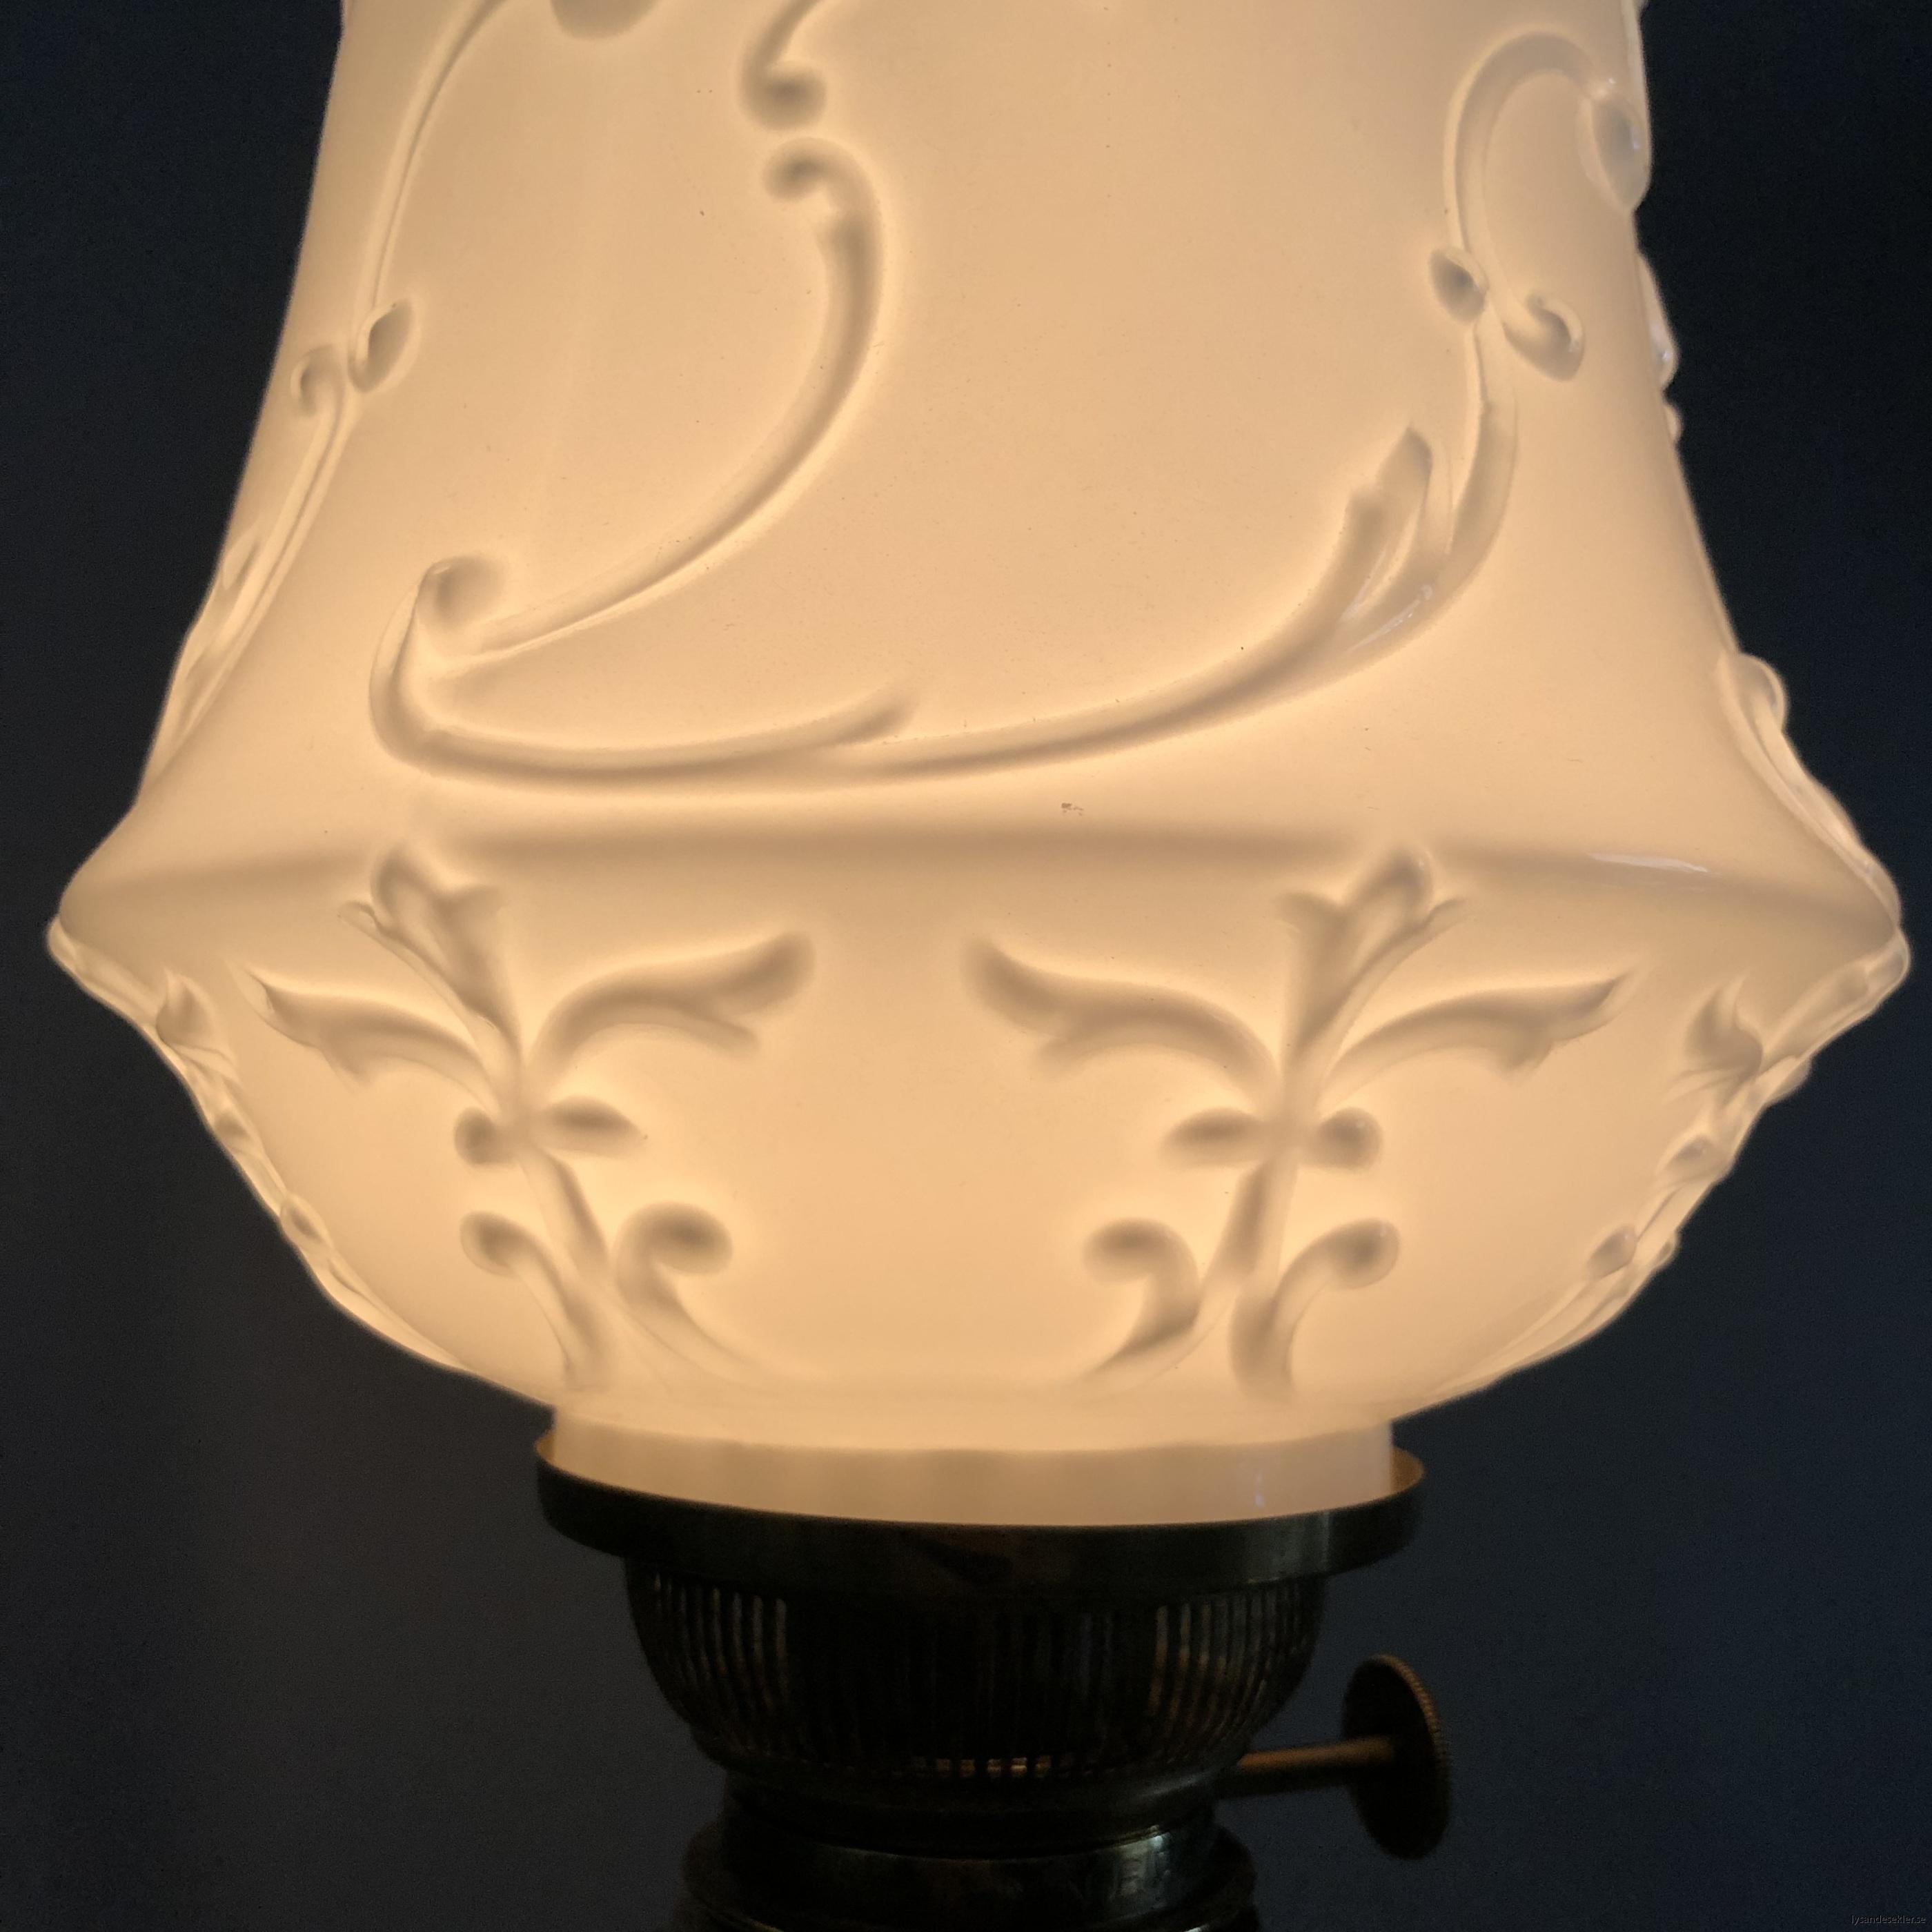 fotogenlampskupa kupa till fotogenlampa tulipan tulpan tulpankupor kupor5